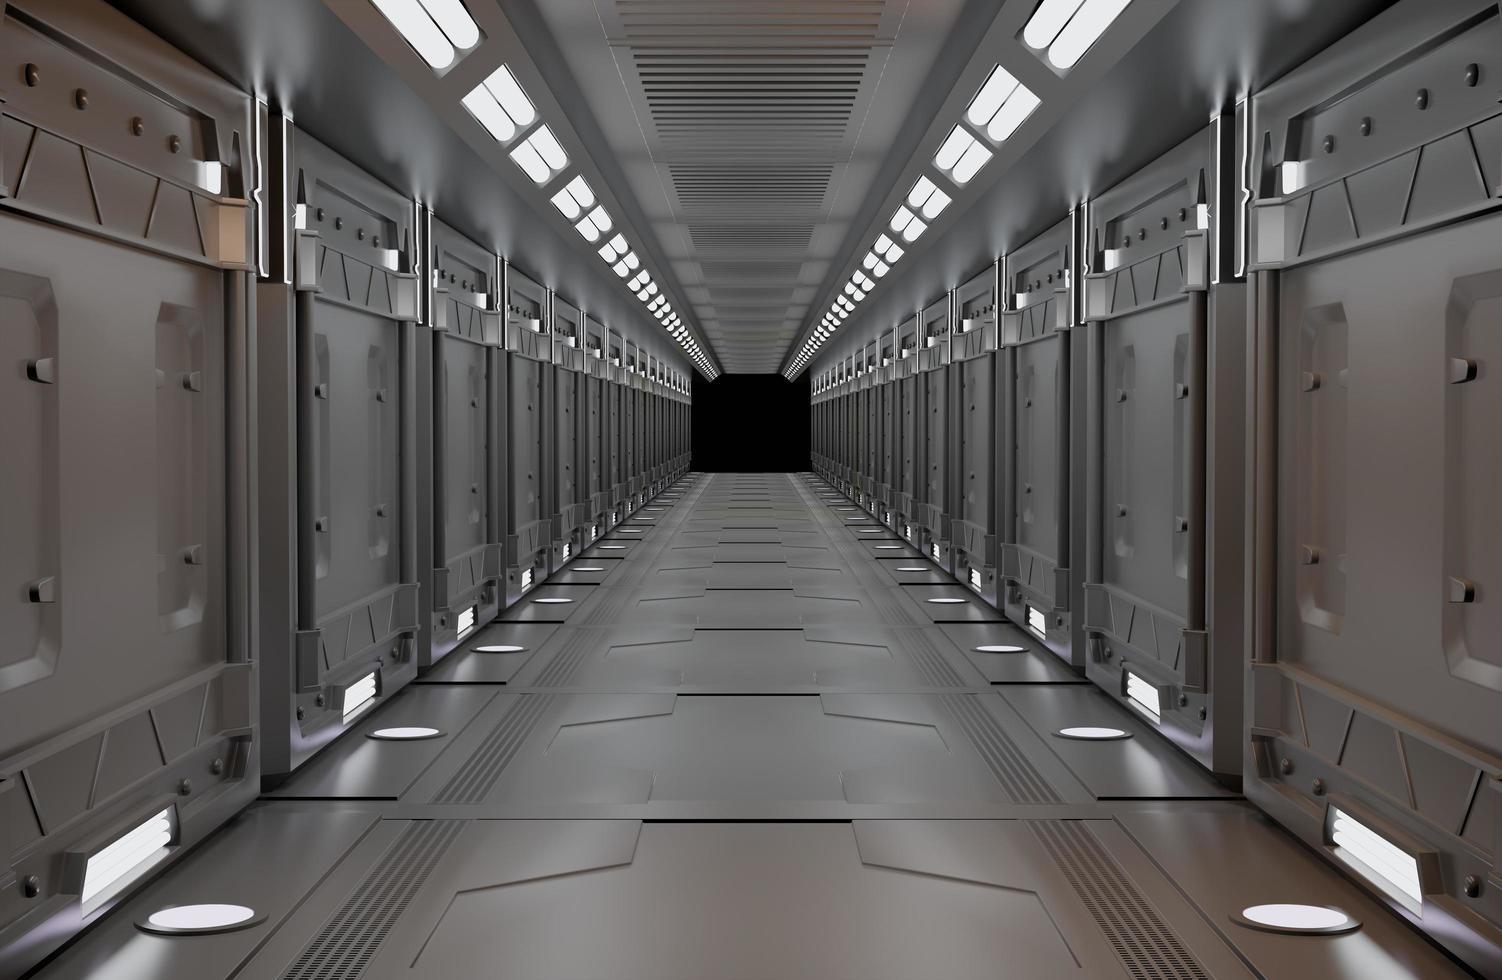 Spaceship metallic interior with view photo